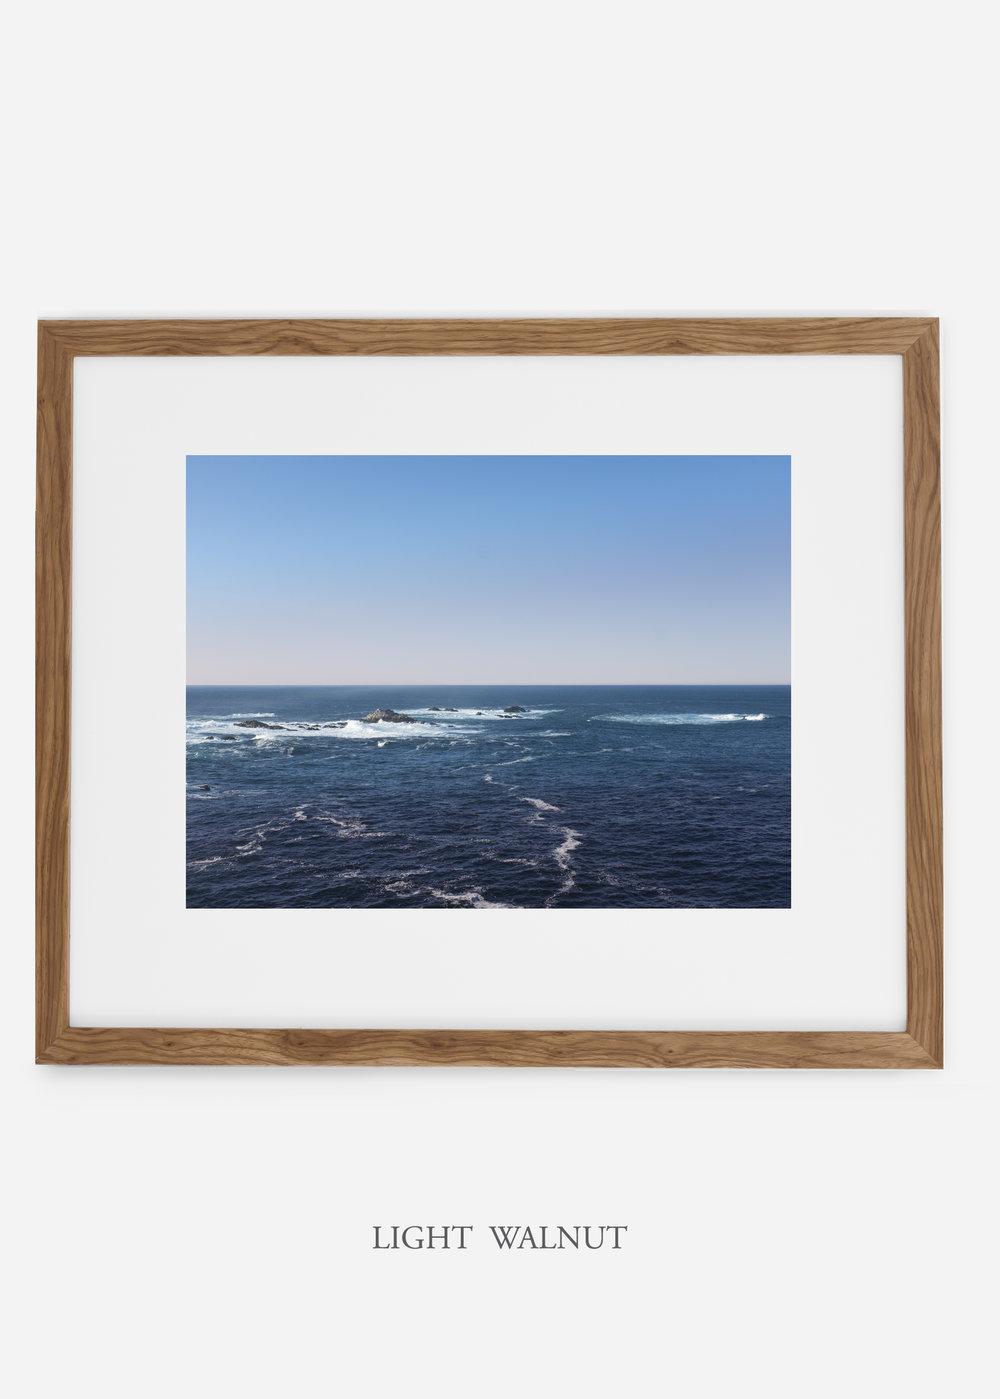 WilderCalifornia_lightwalnutframe_interiordesign_oceanprint_PacificOceanNo.1.jpg